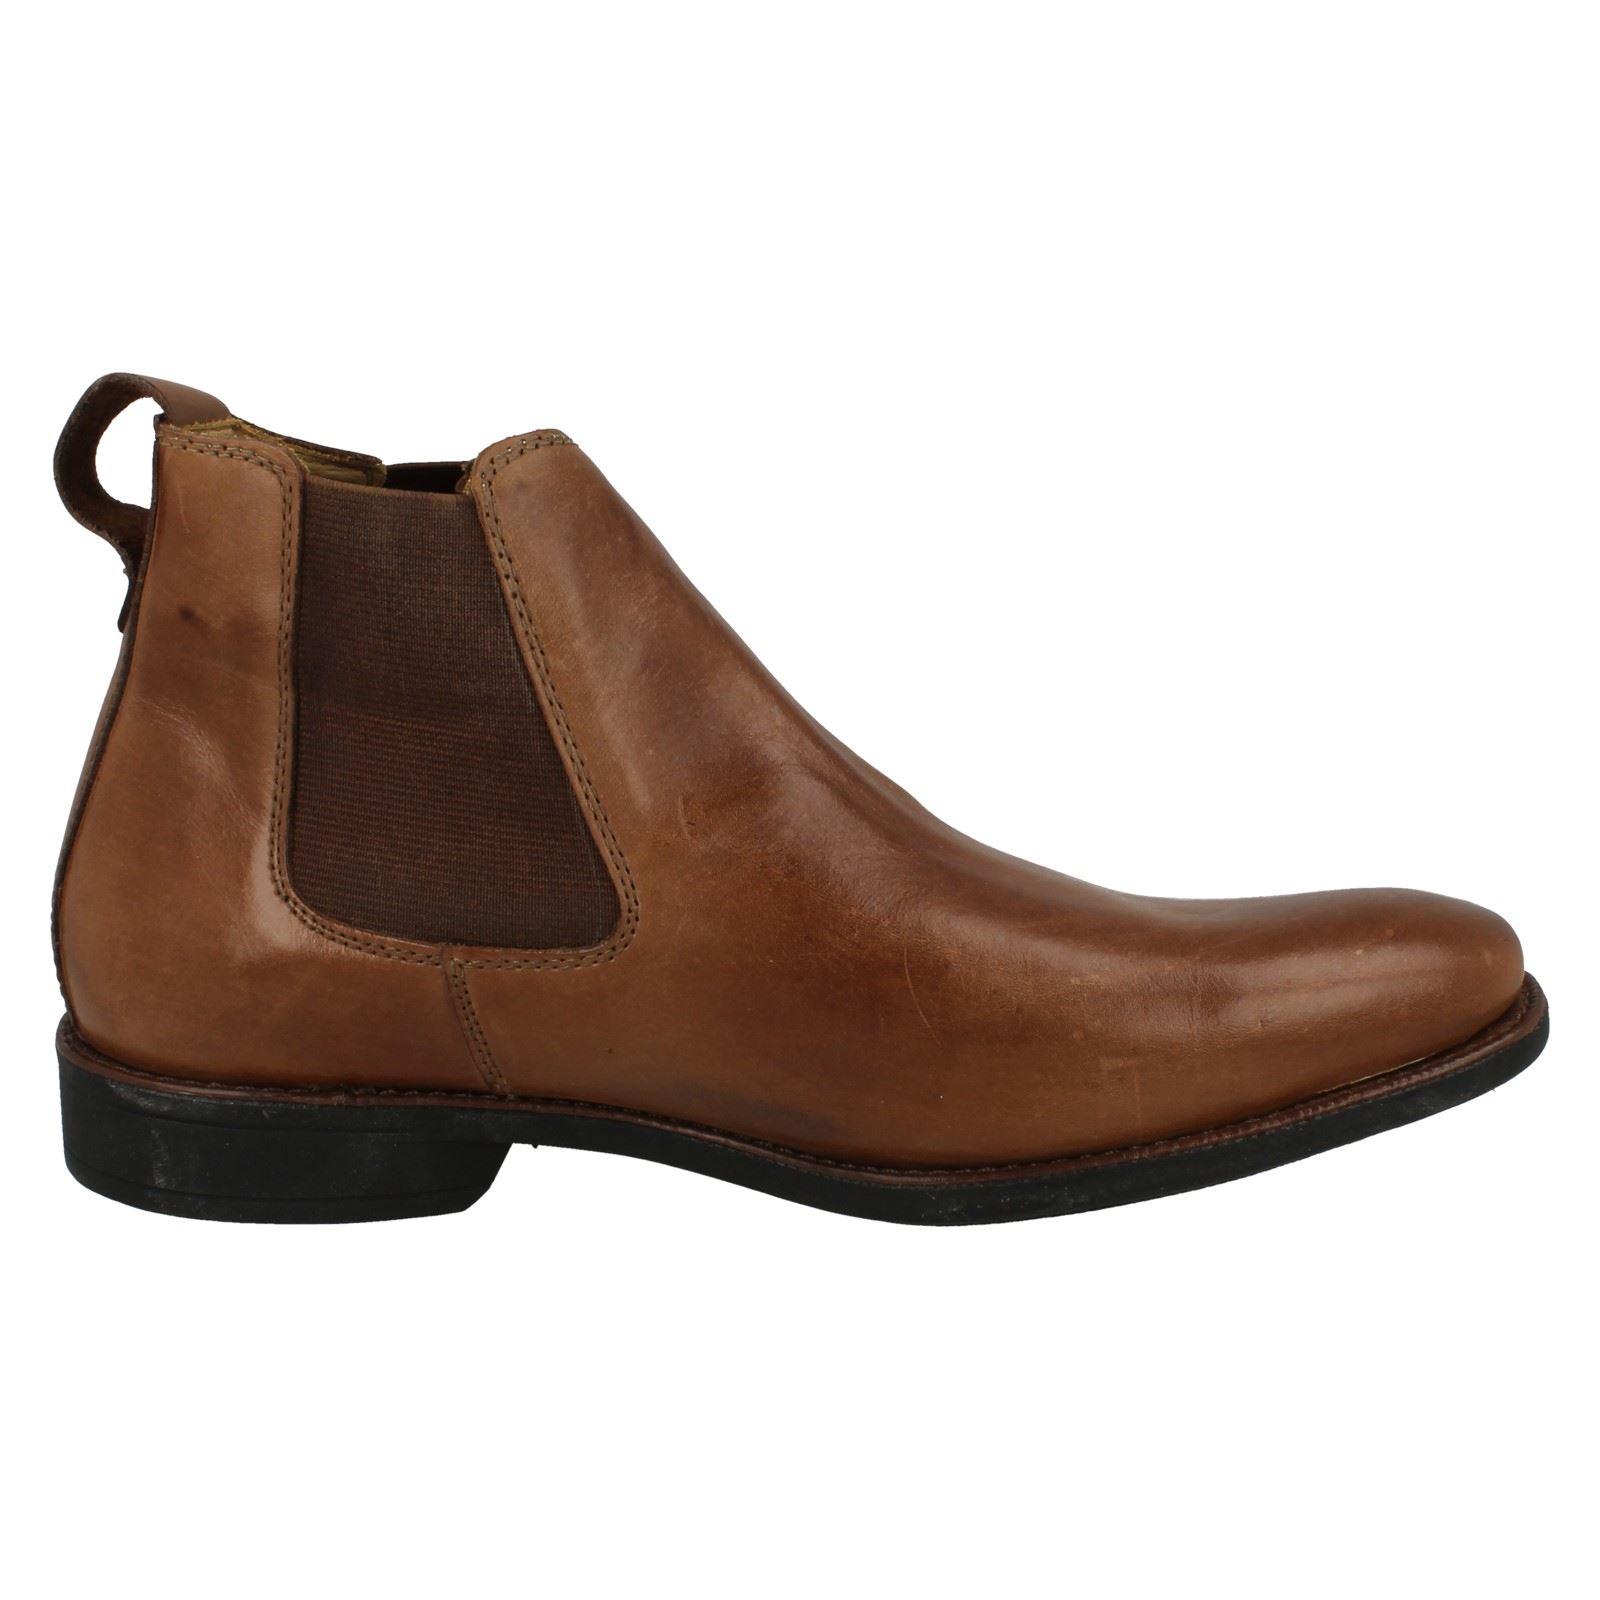 Mens-Anatomic-Chelsea-Boots-039-929211LB-039 thumbnail 18